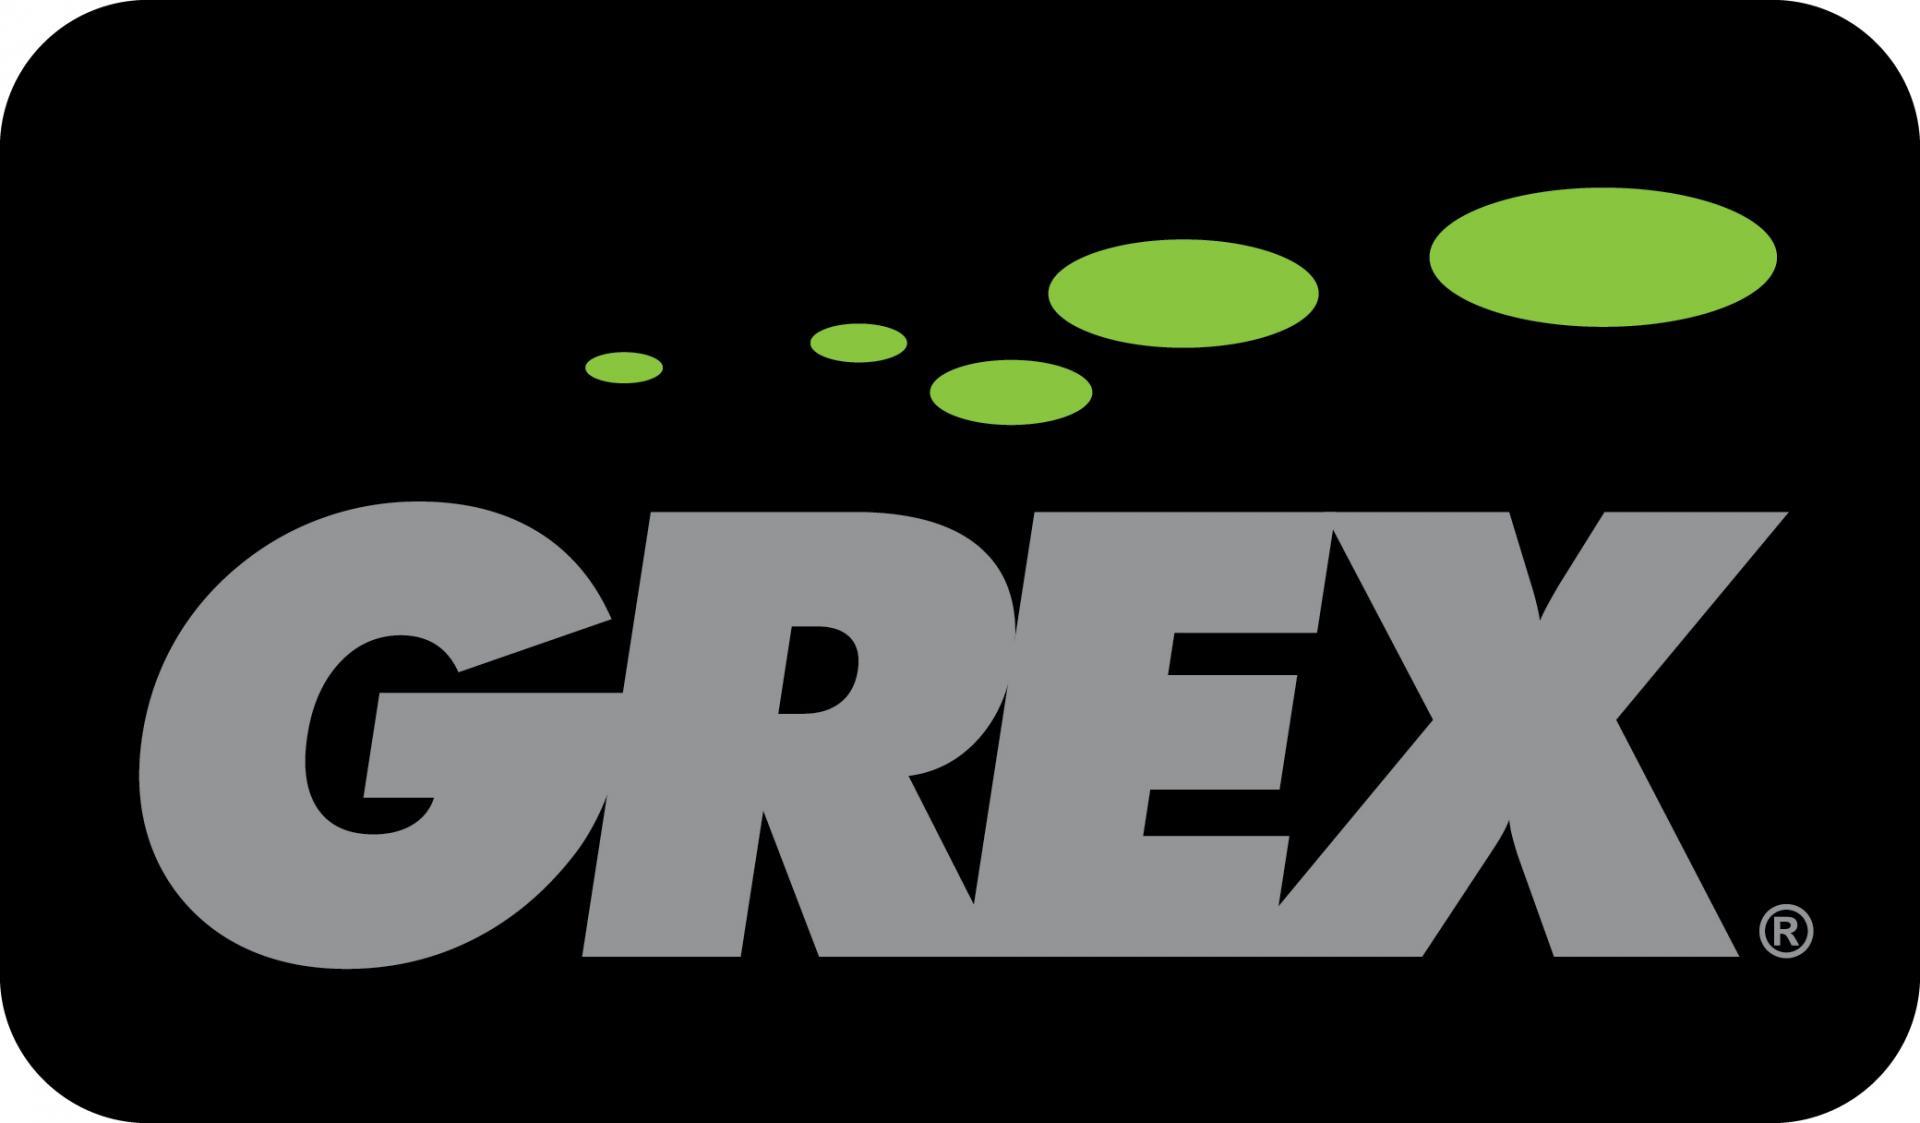 grex_airbrush_logo_blk_bg.jpg